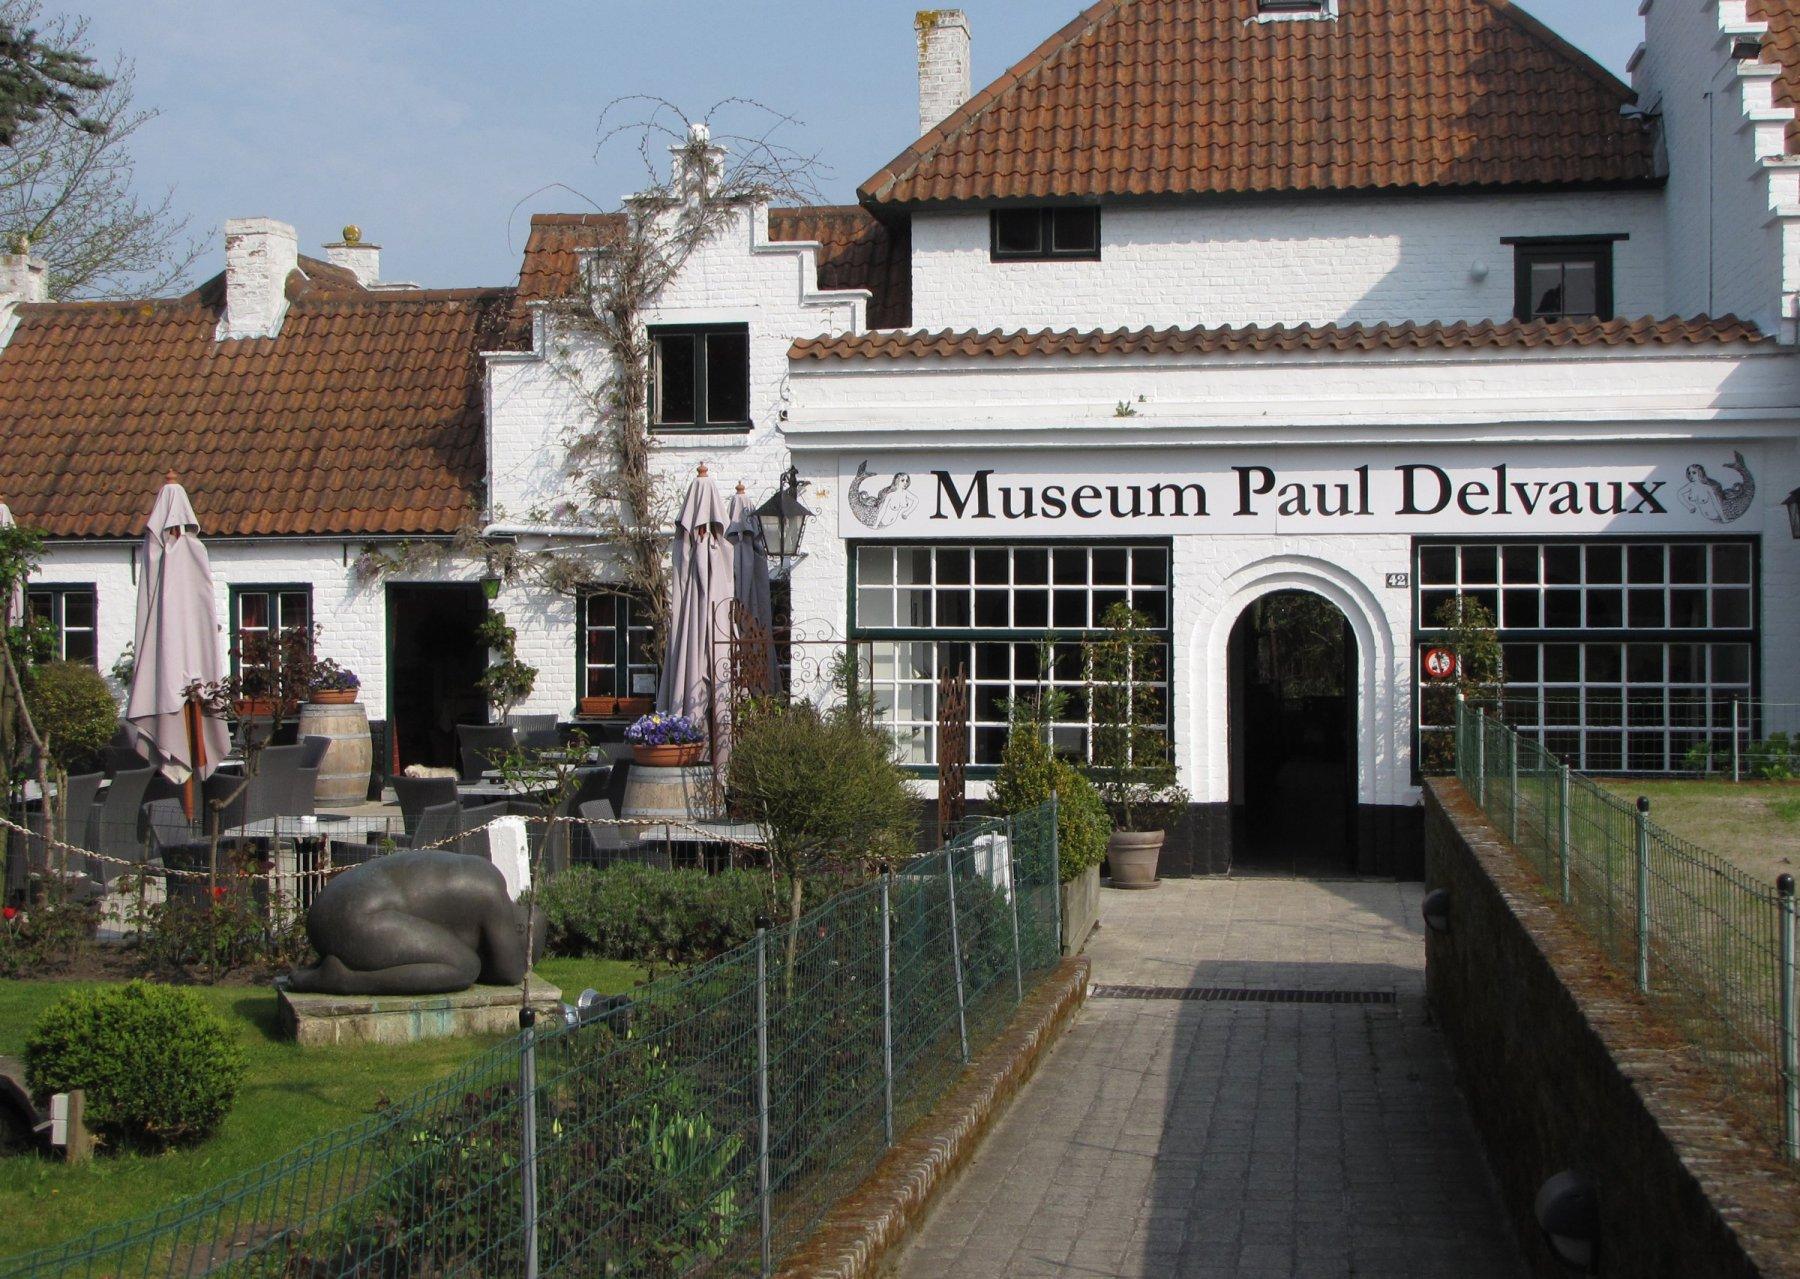 Delvauxmuseum